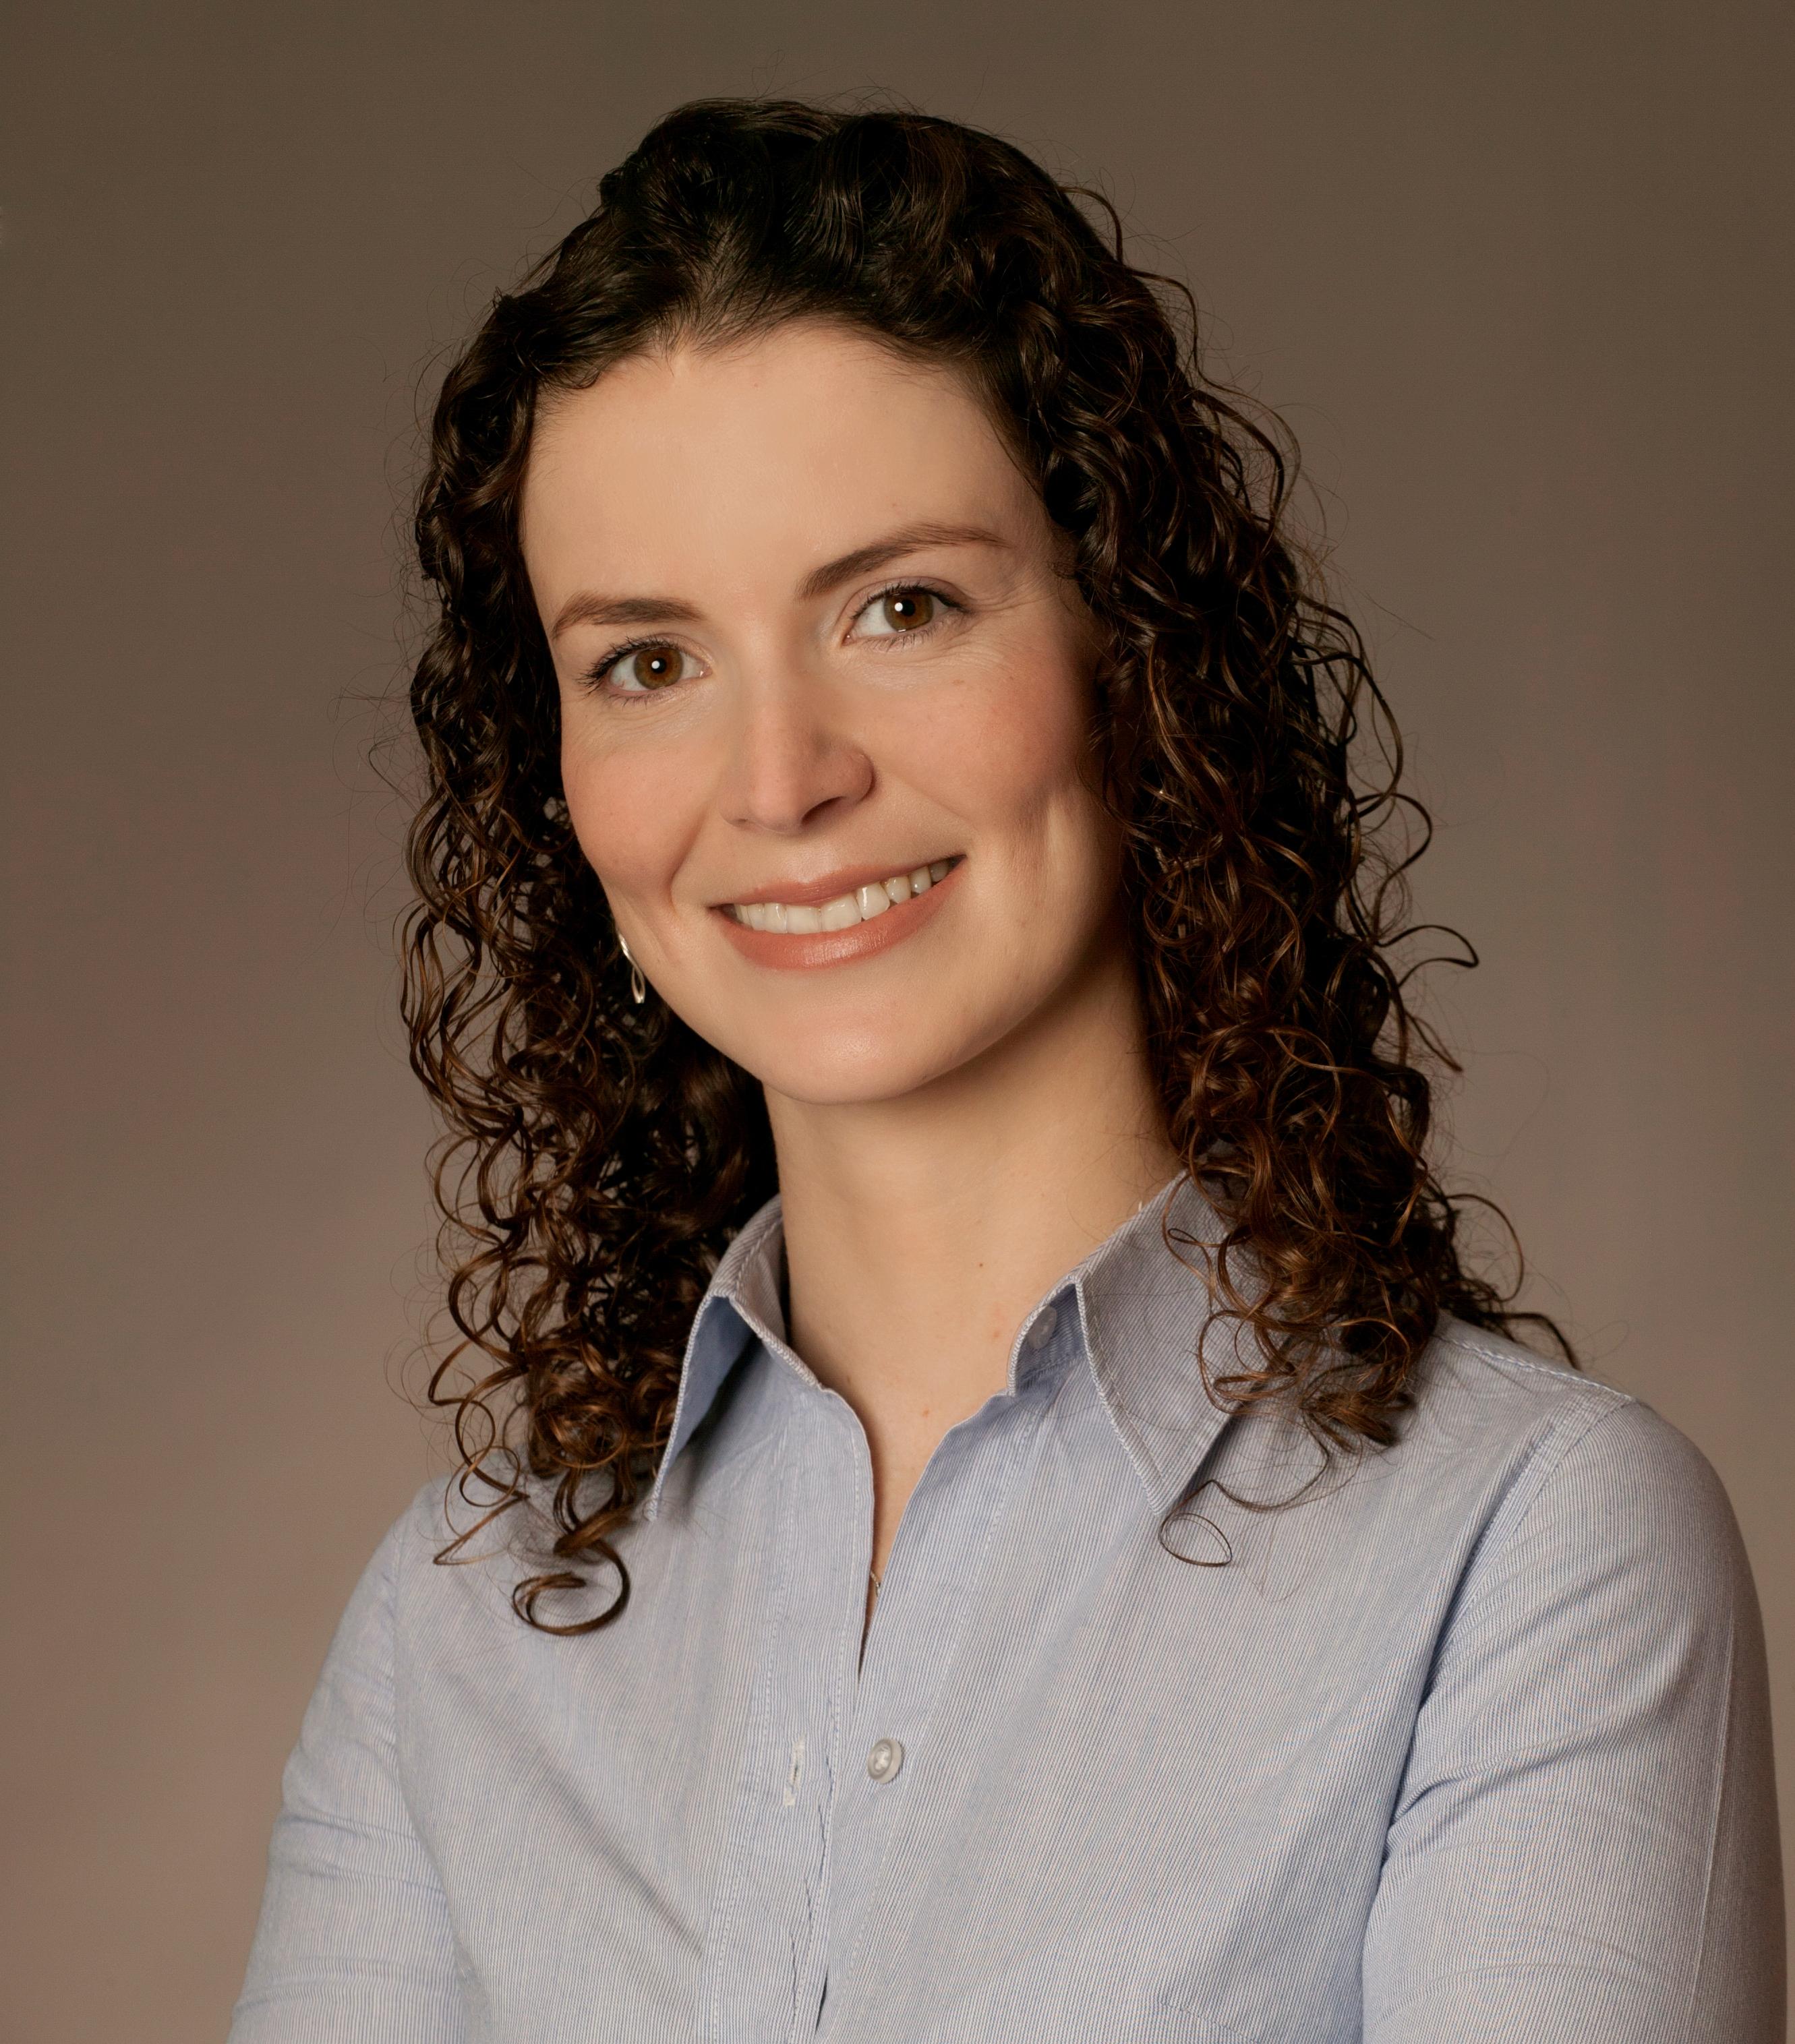 Daniela R. Recchia